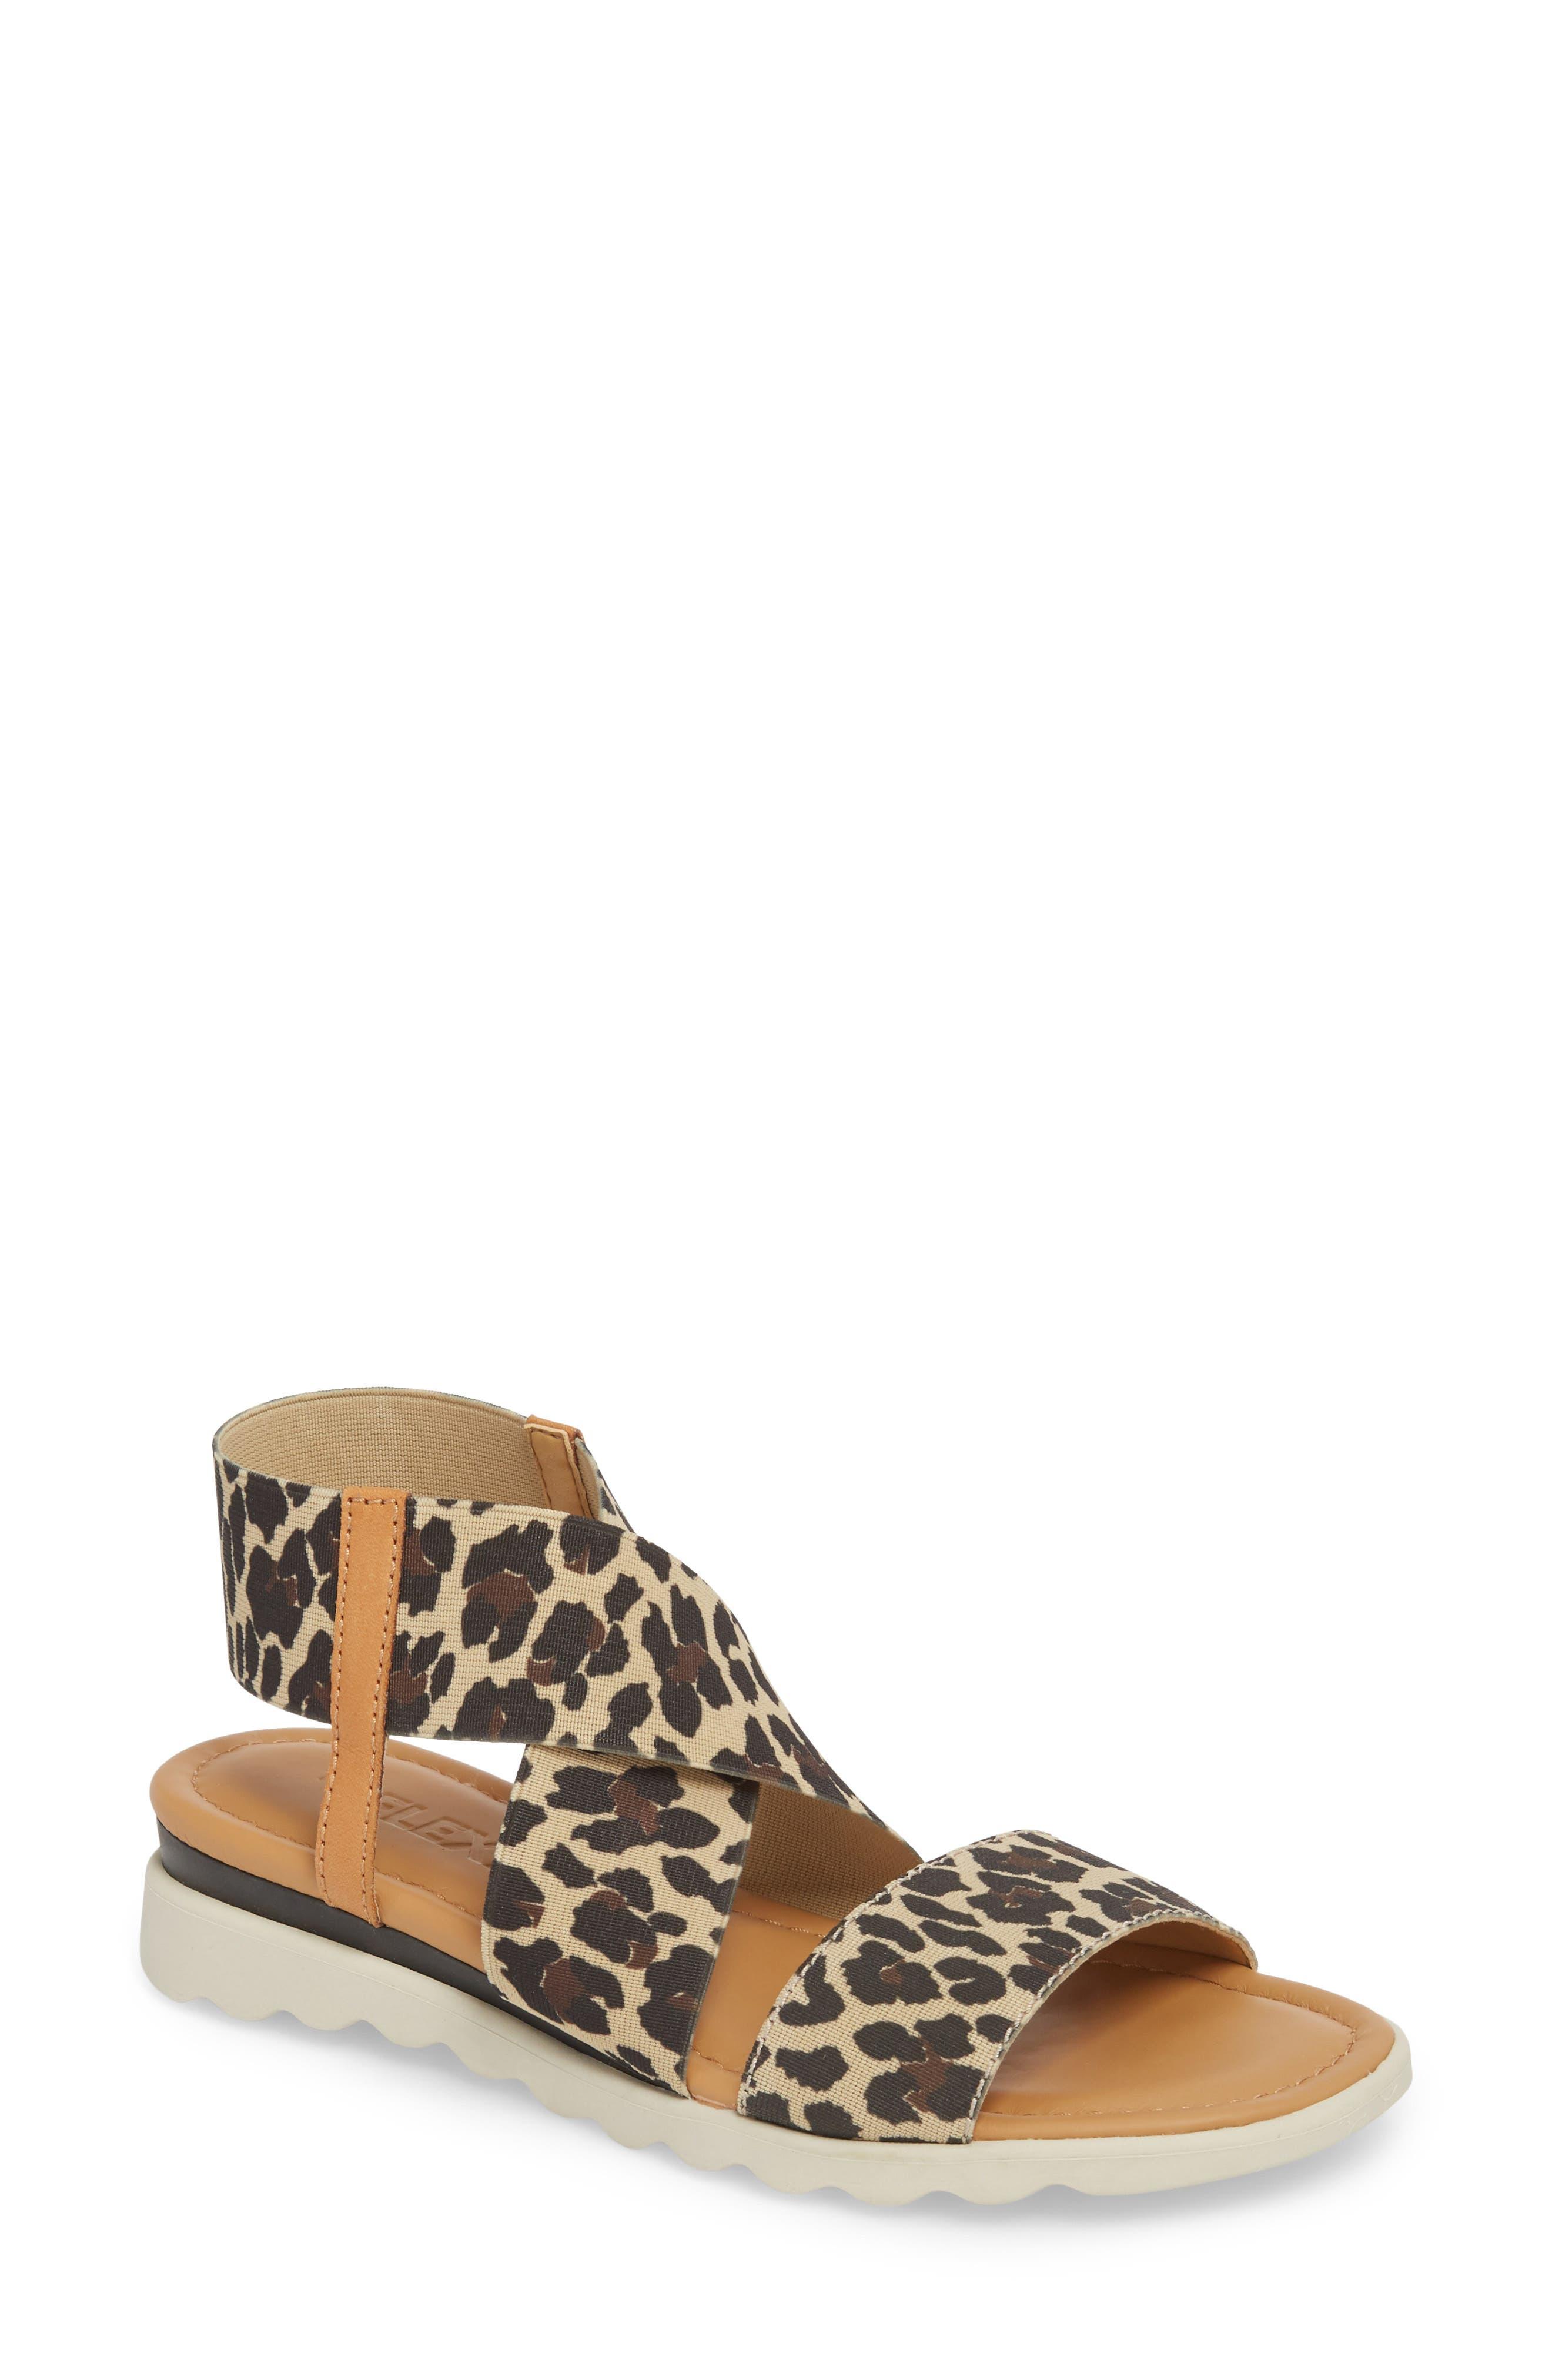 The Flexx Extra Sandal- Brown